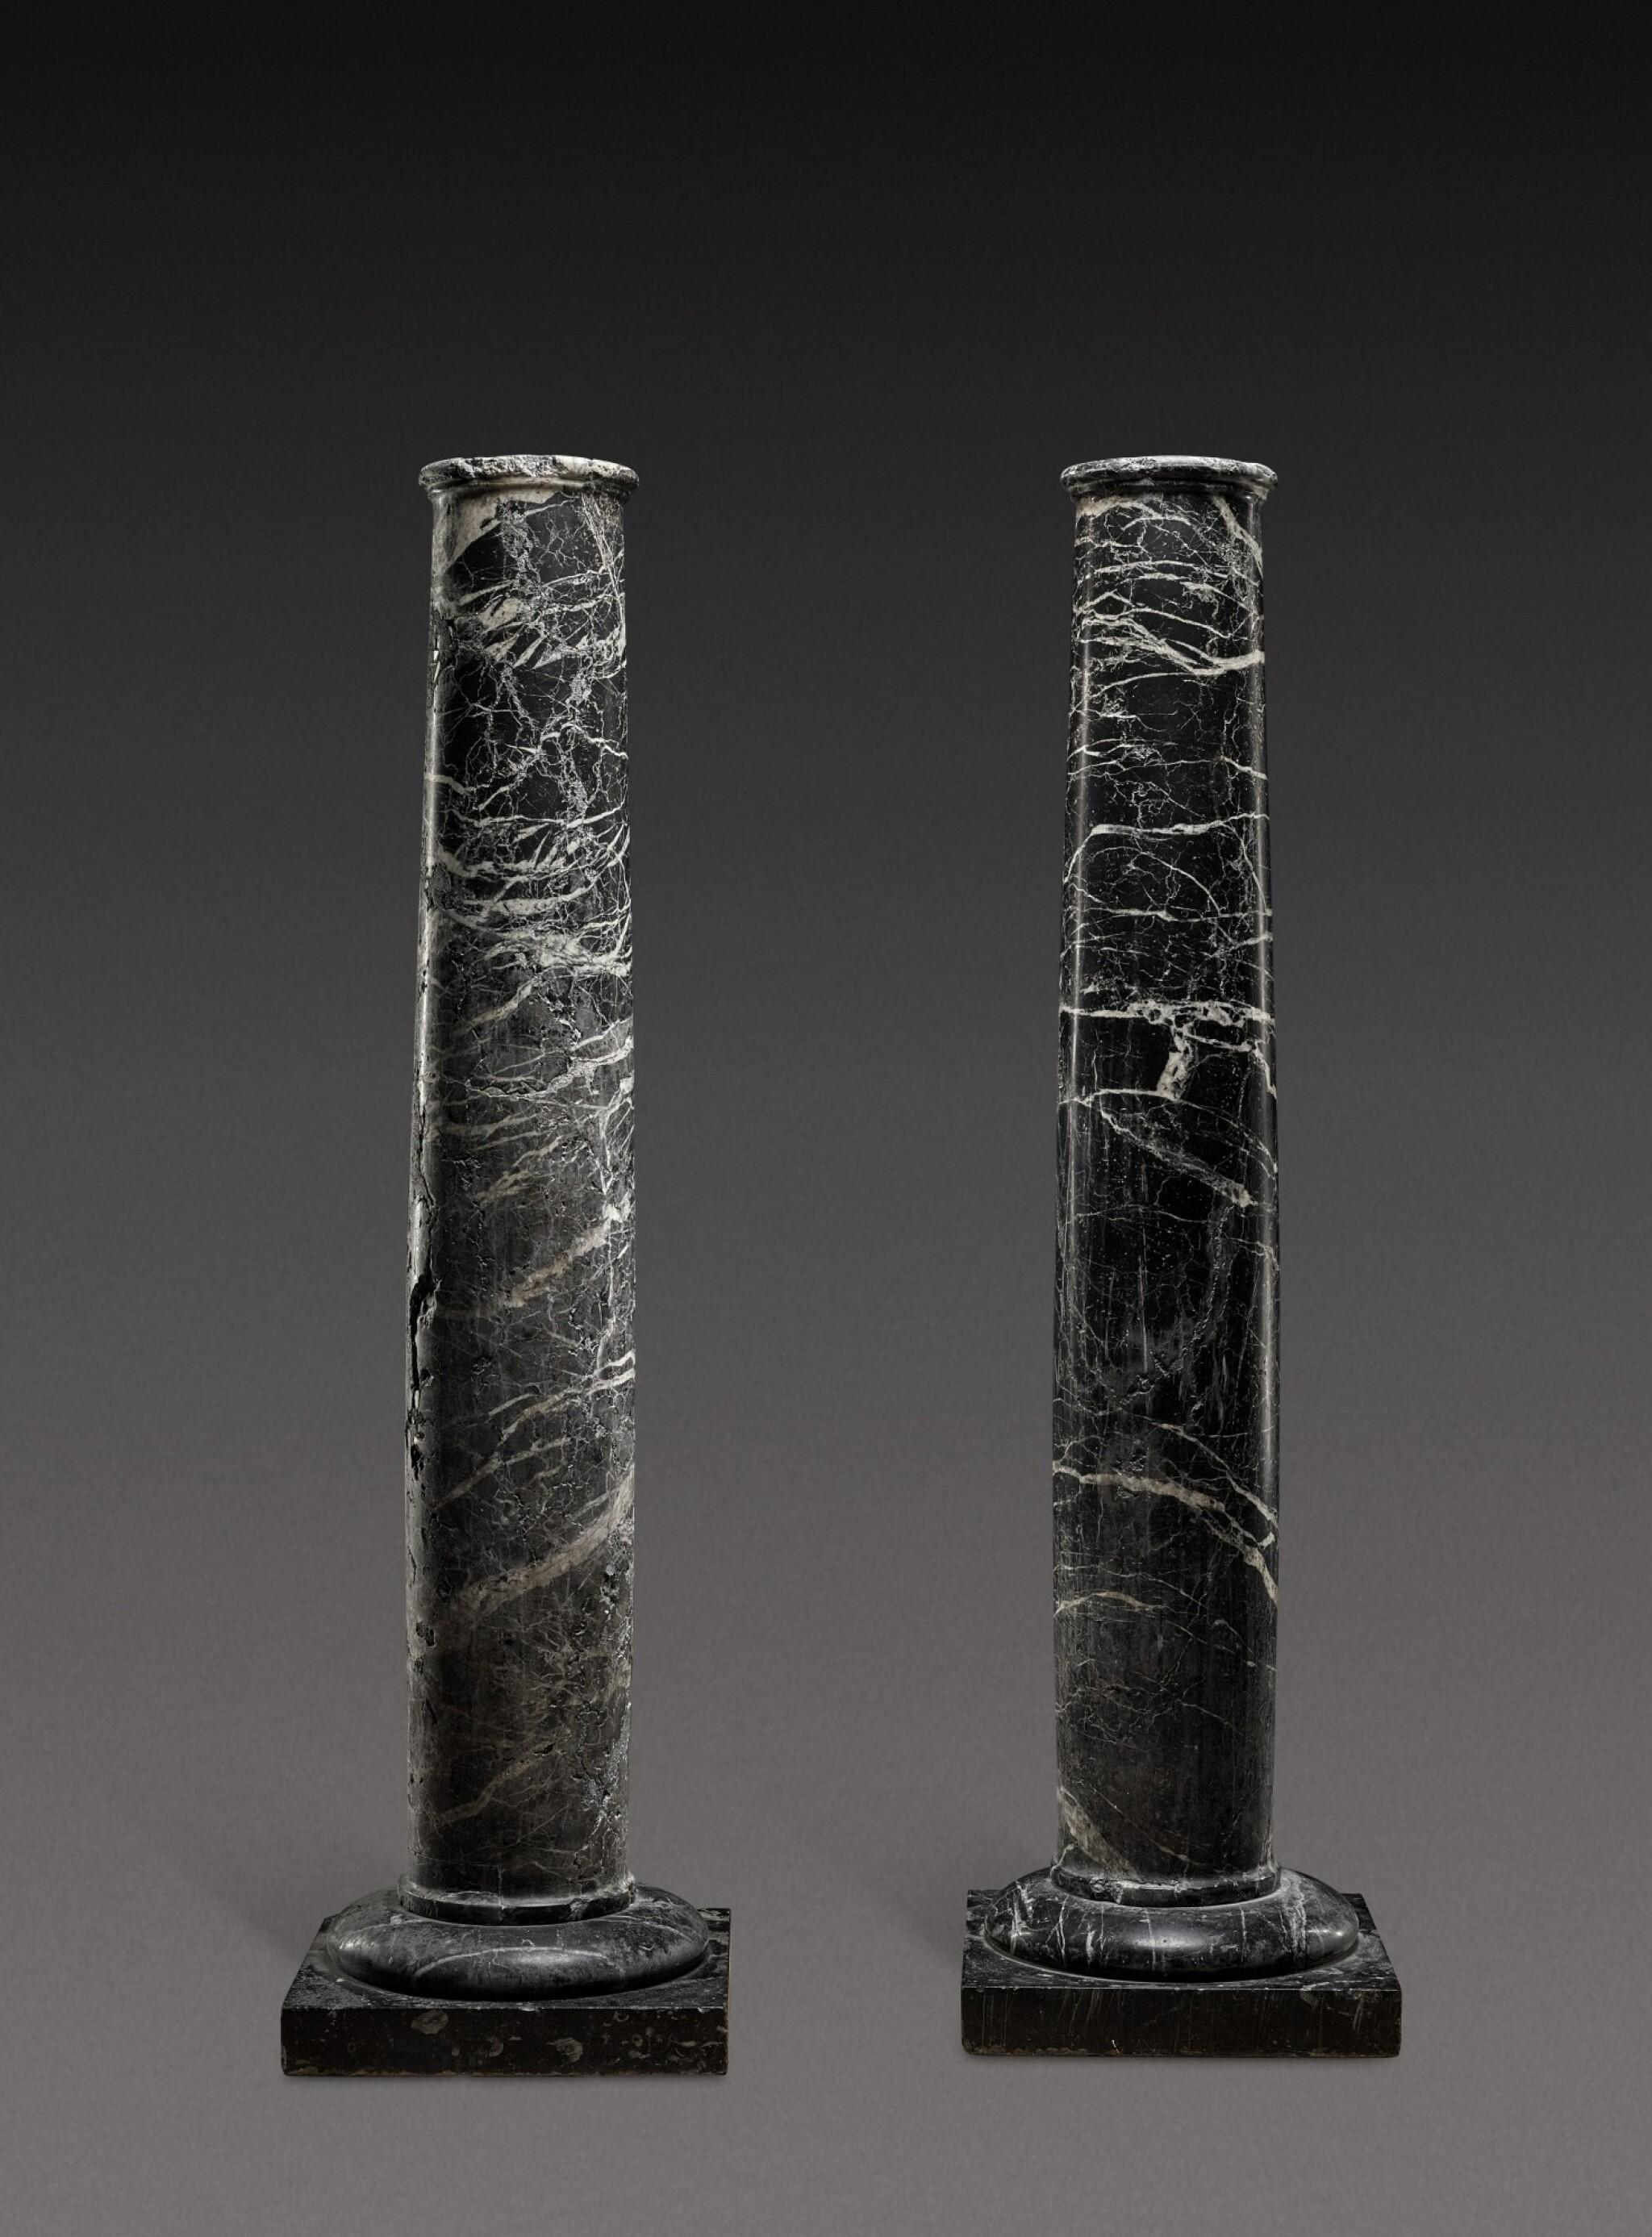 View 1 of Lot 155. Italian, 19th century | Pair of Columns.